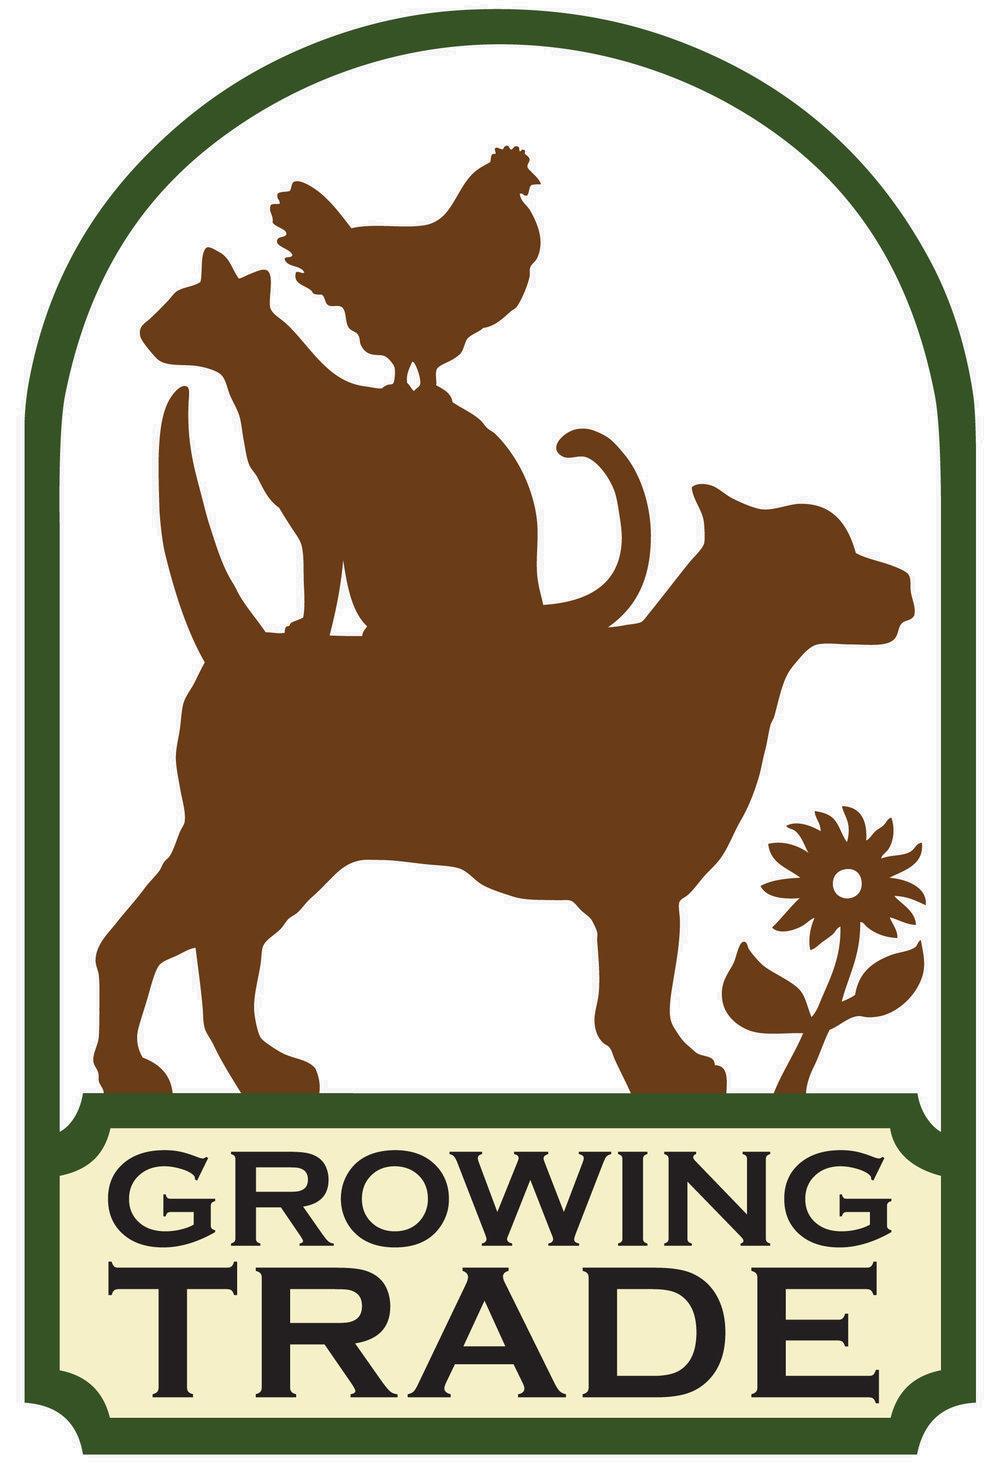 Growing-Trade.jpg